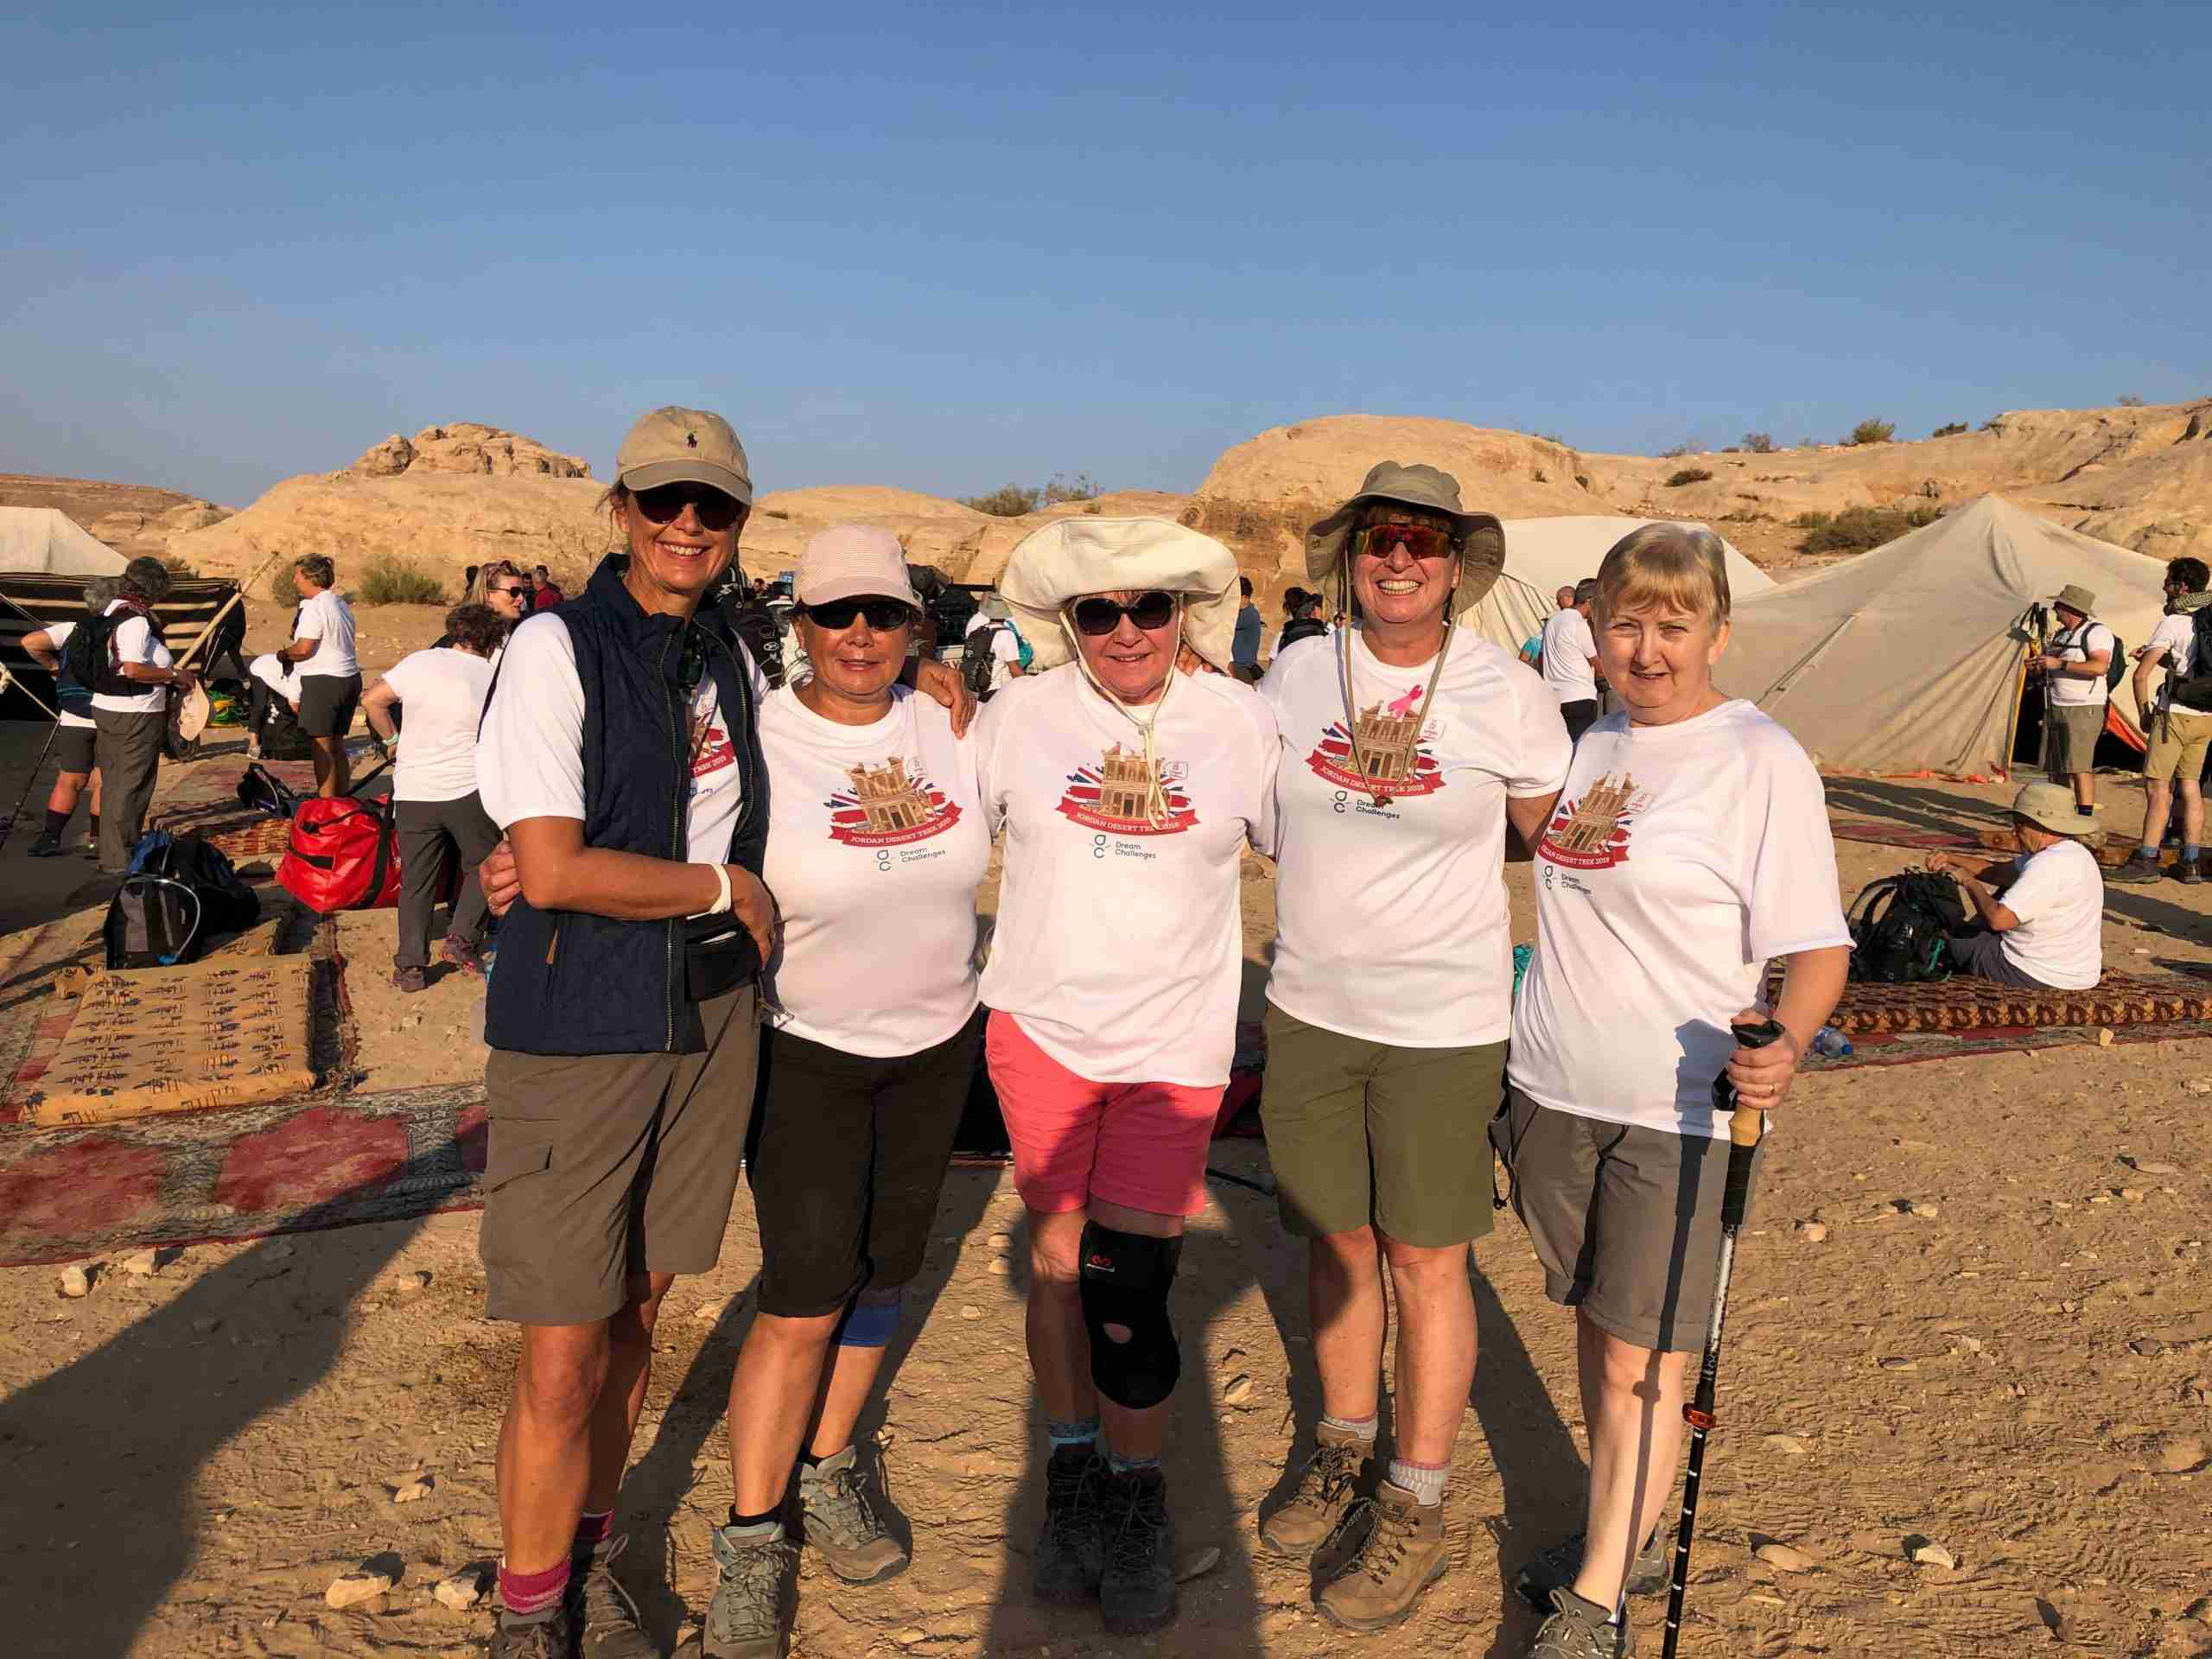 The Jordan trek